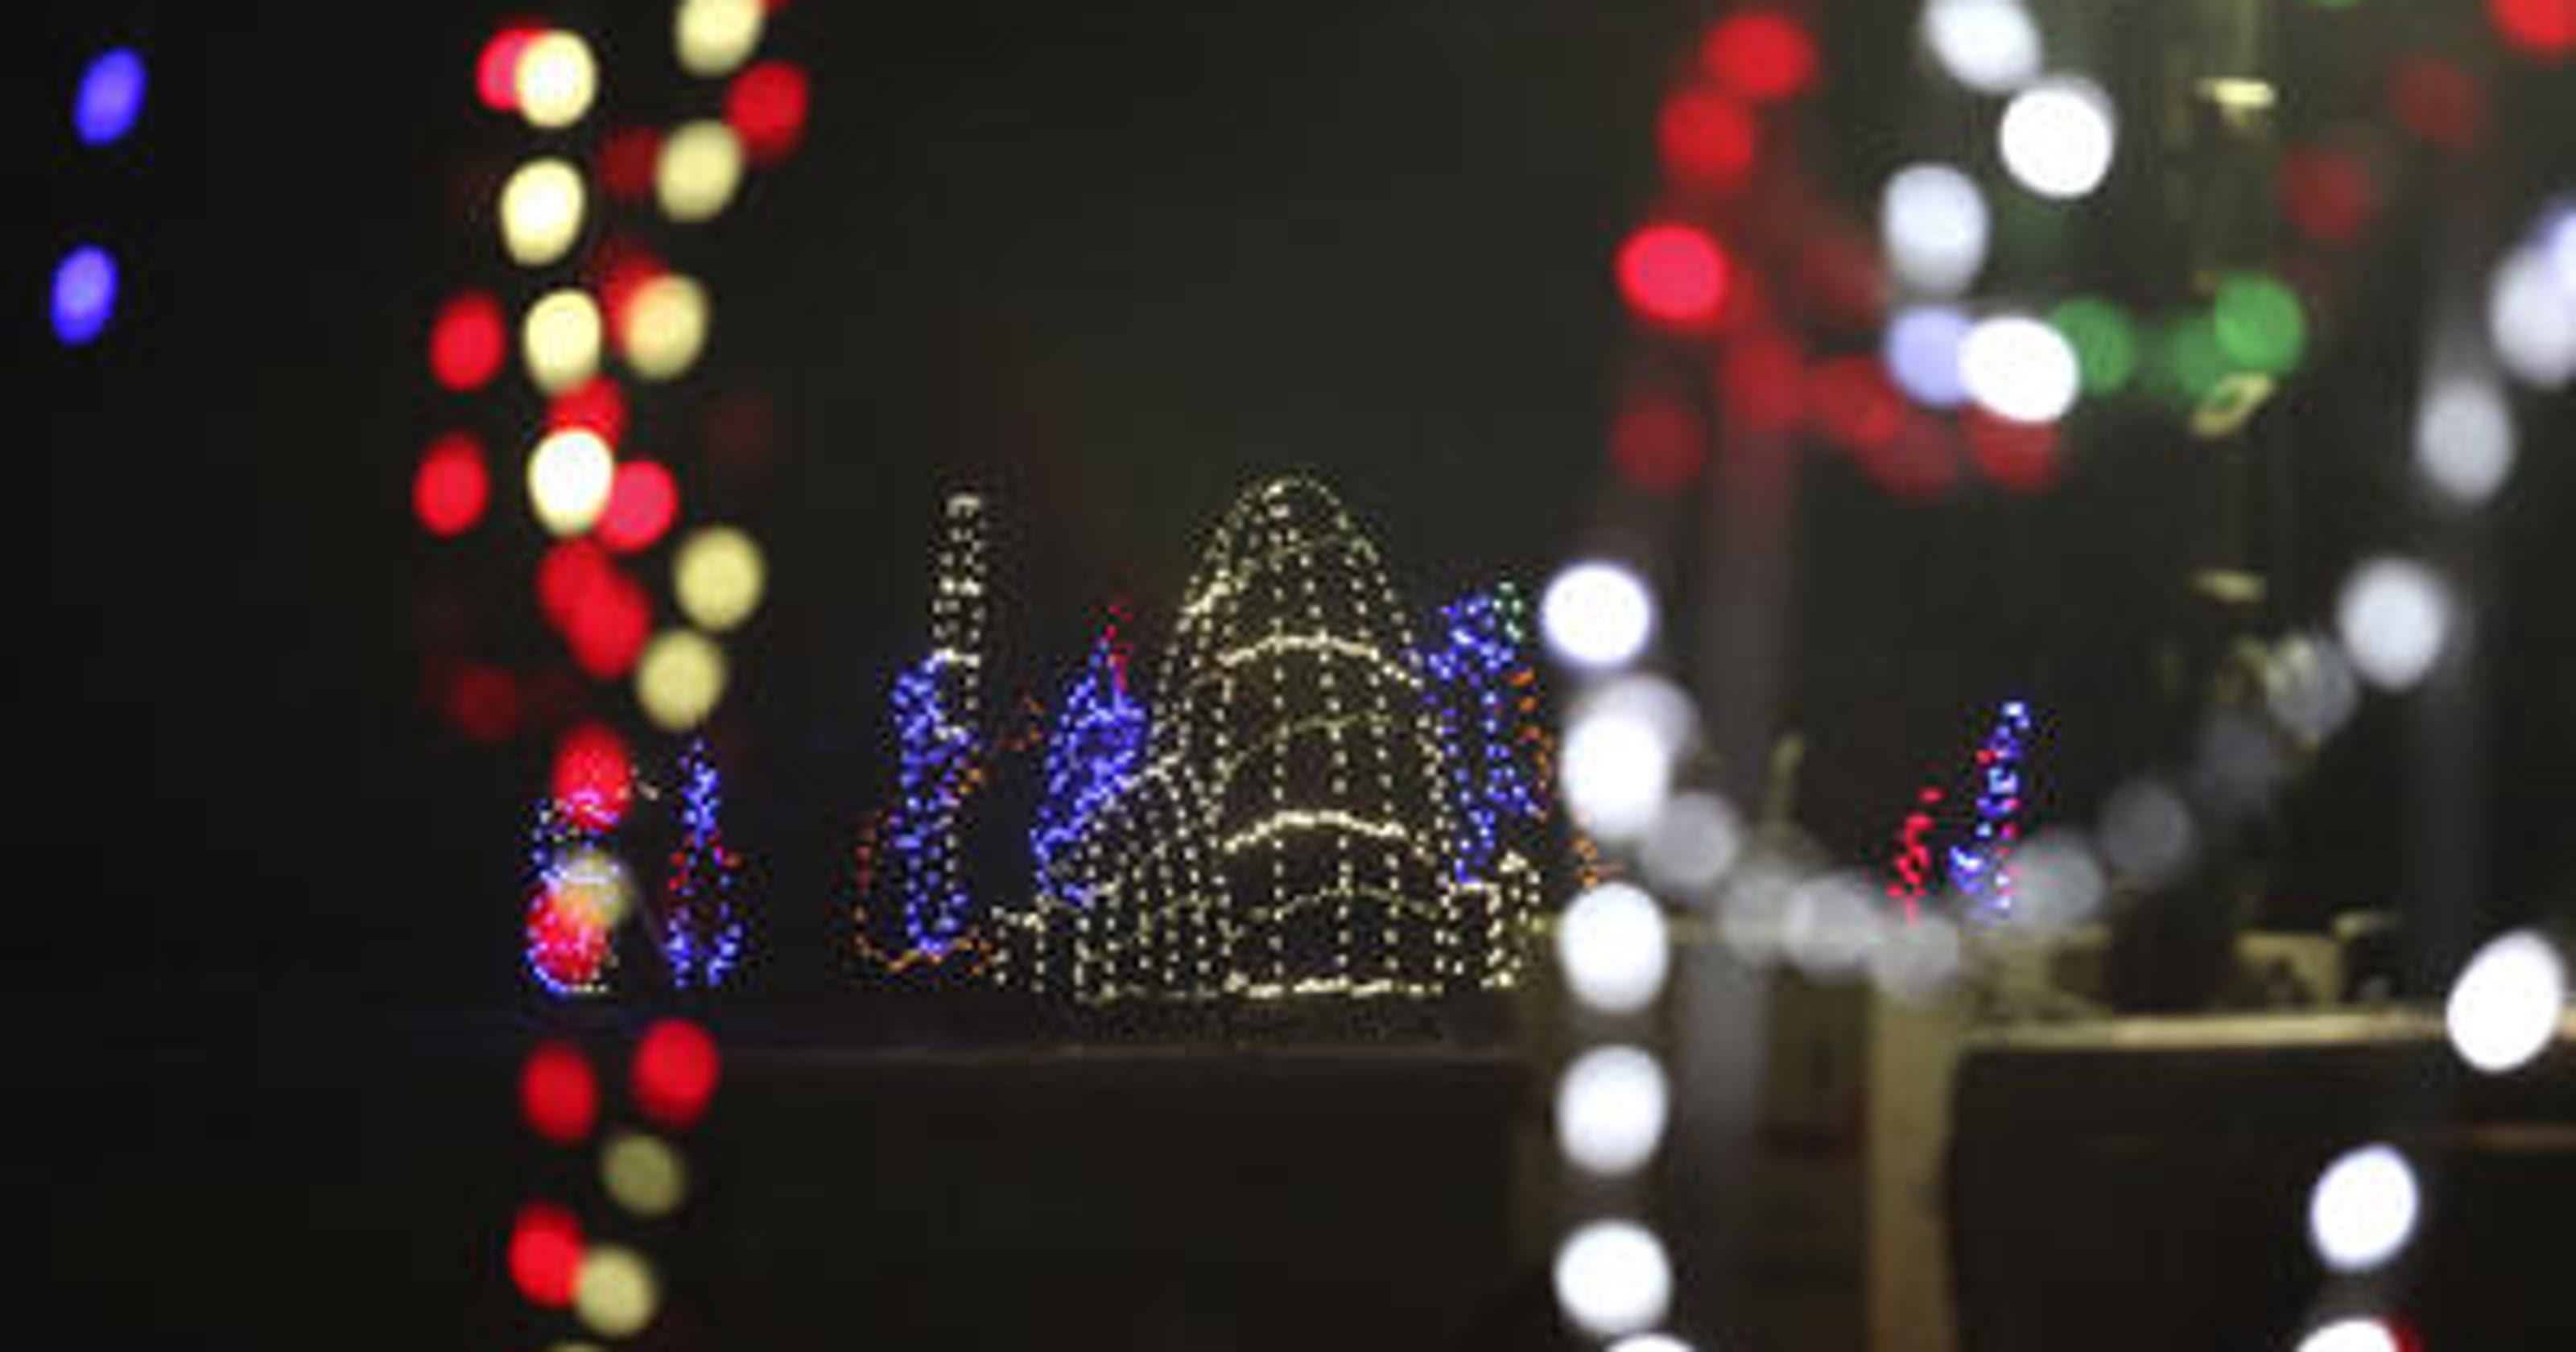 Mega Cavern Christmas Lights.Lights Under Louisville In Mega Cavern Adds 1 Million Lights